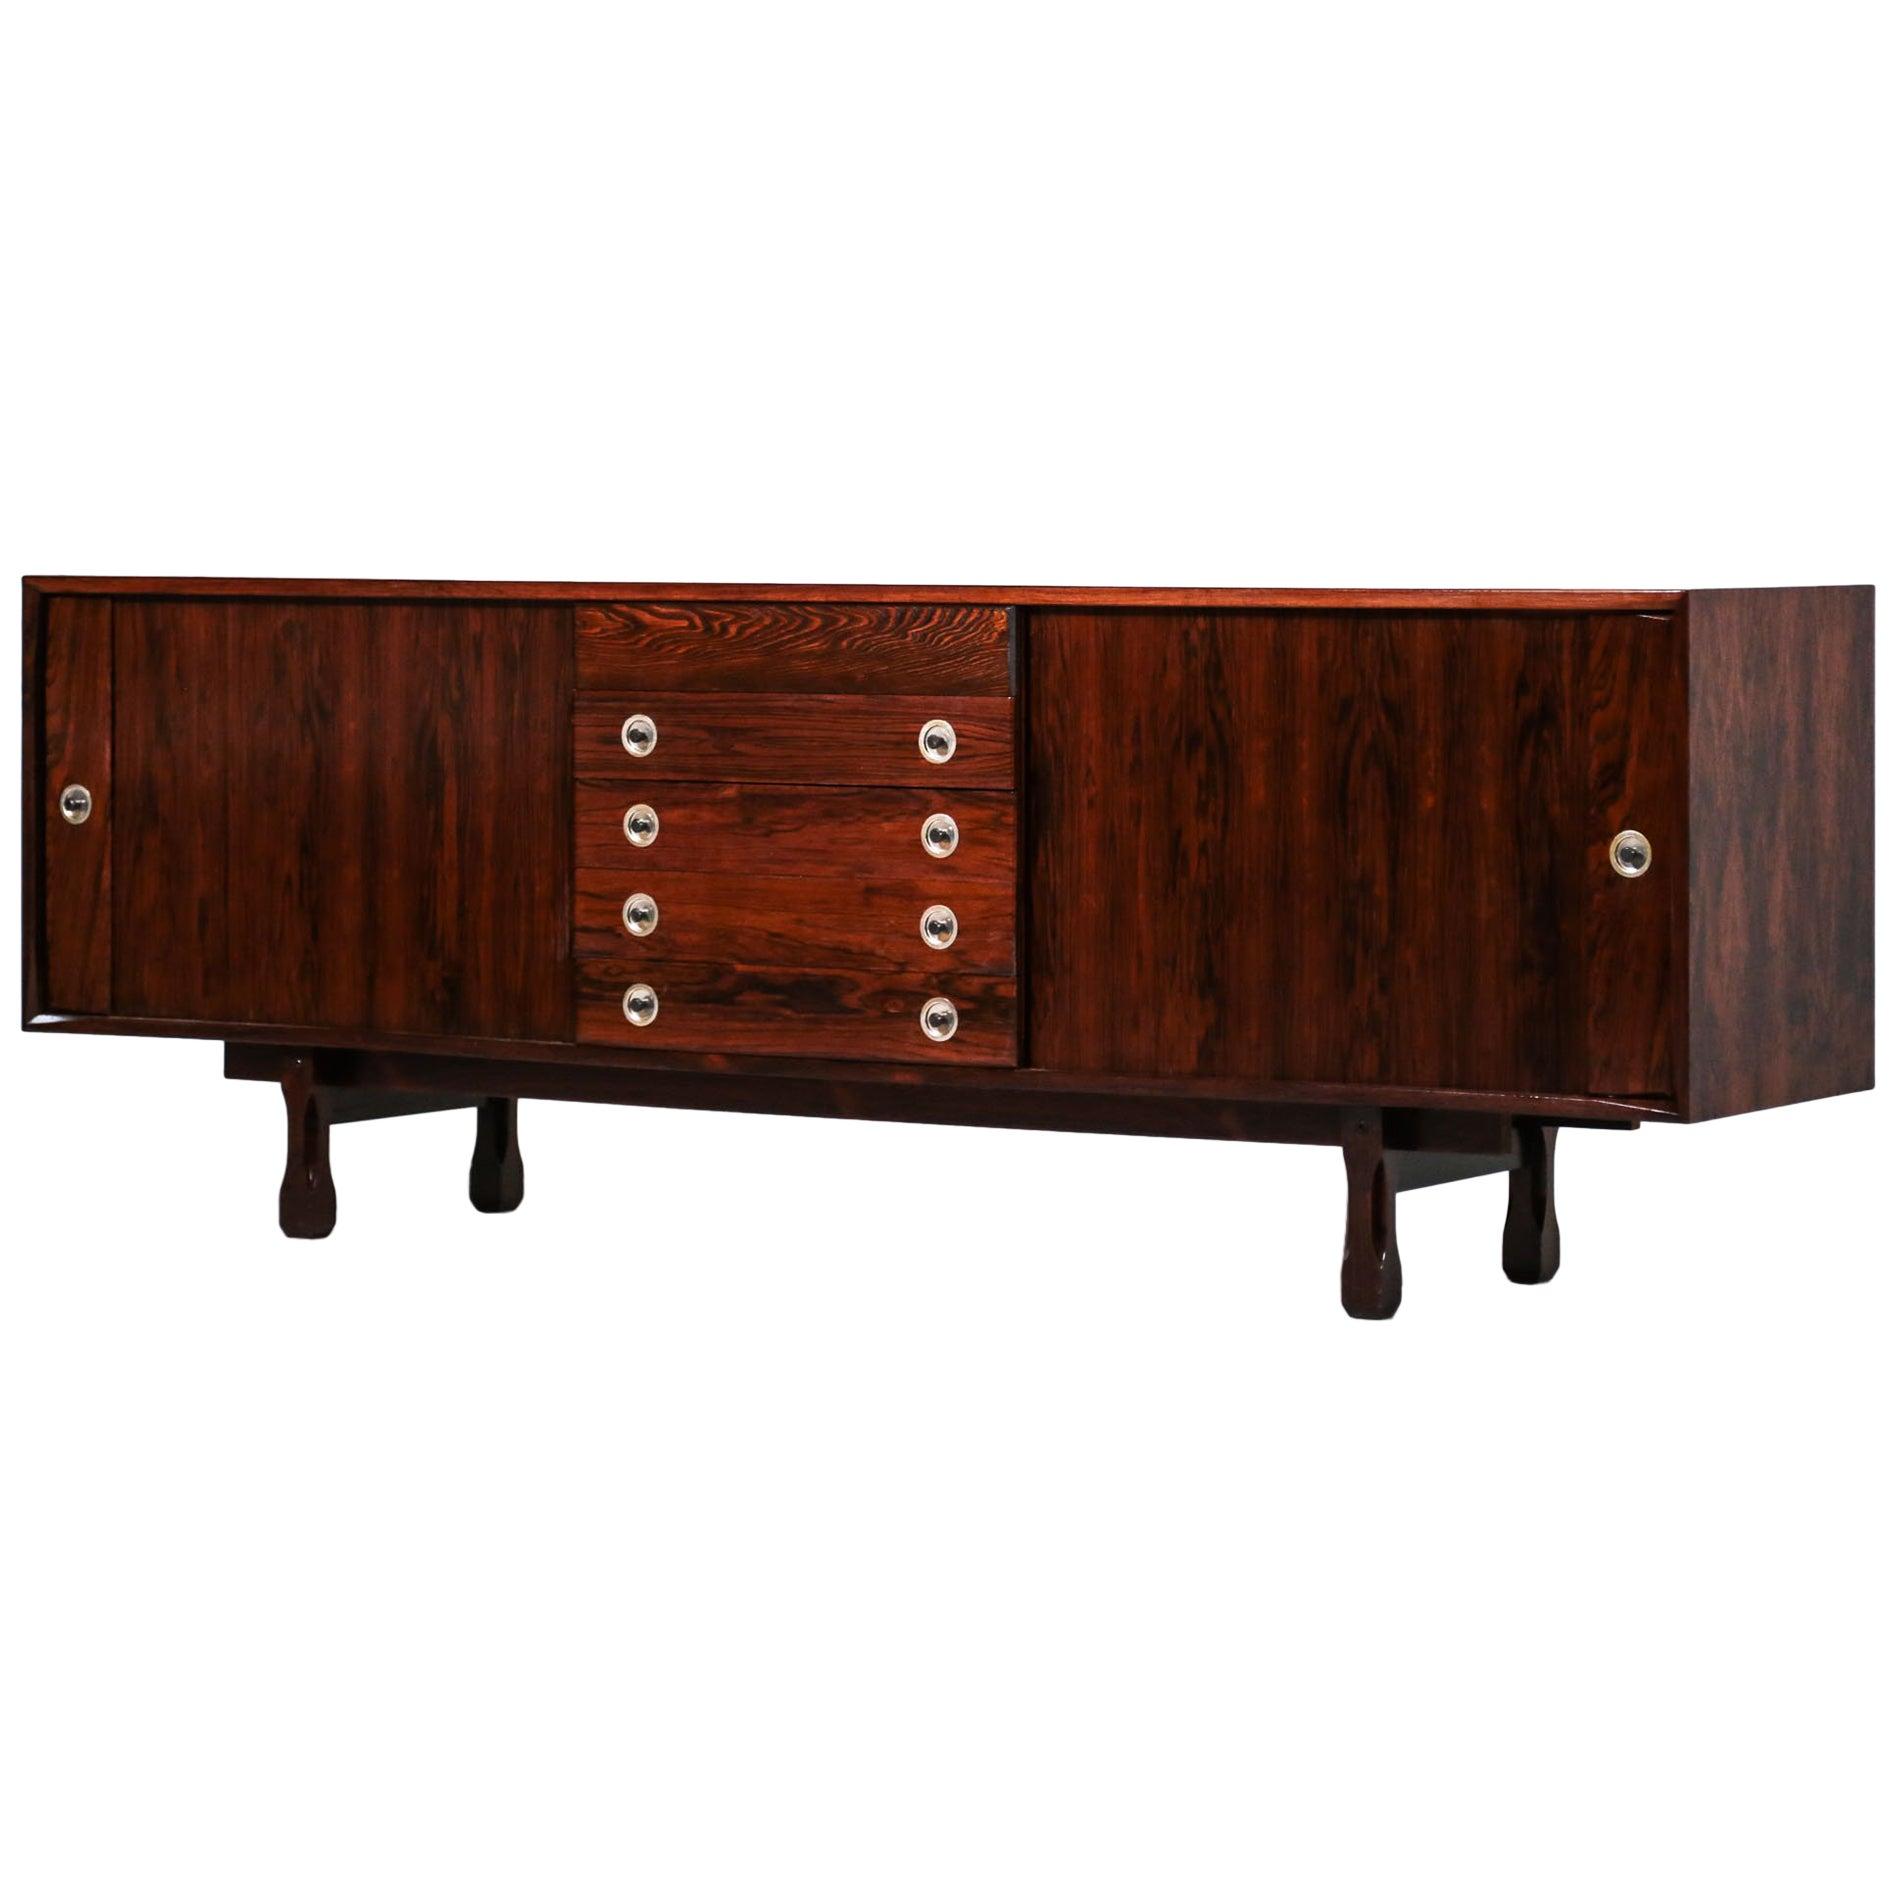 Italian Rosewood Sideboard, 1960s Design in Style of Gianfranco Frattini